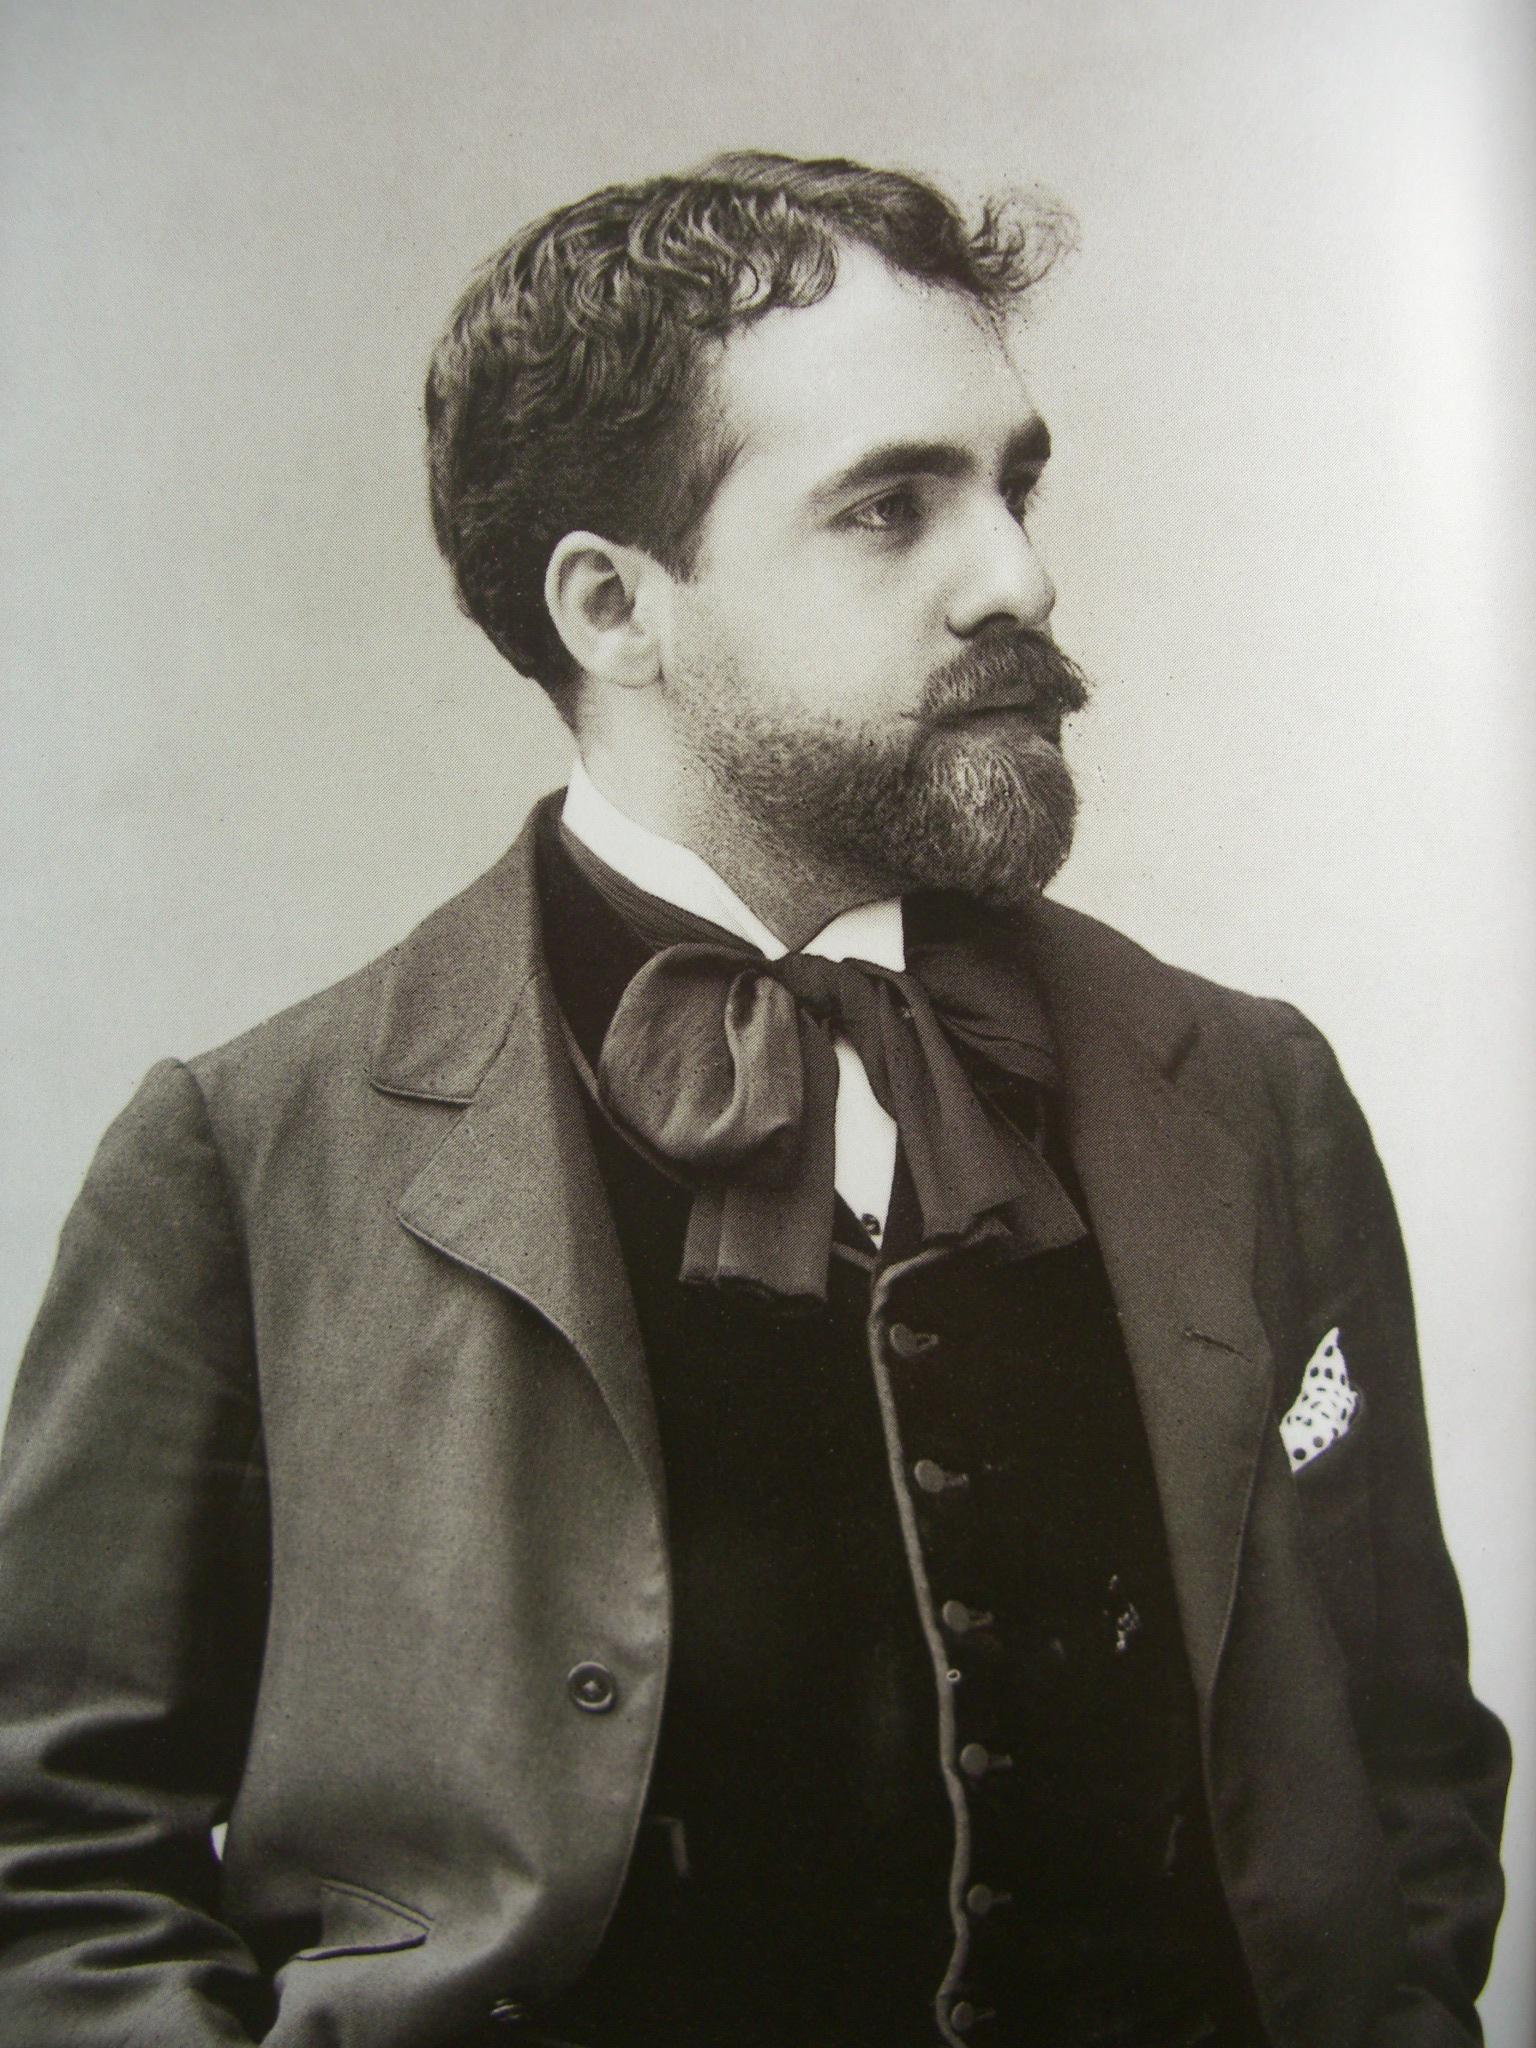 Reynaldo Hahn, image via Wikimedia Common